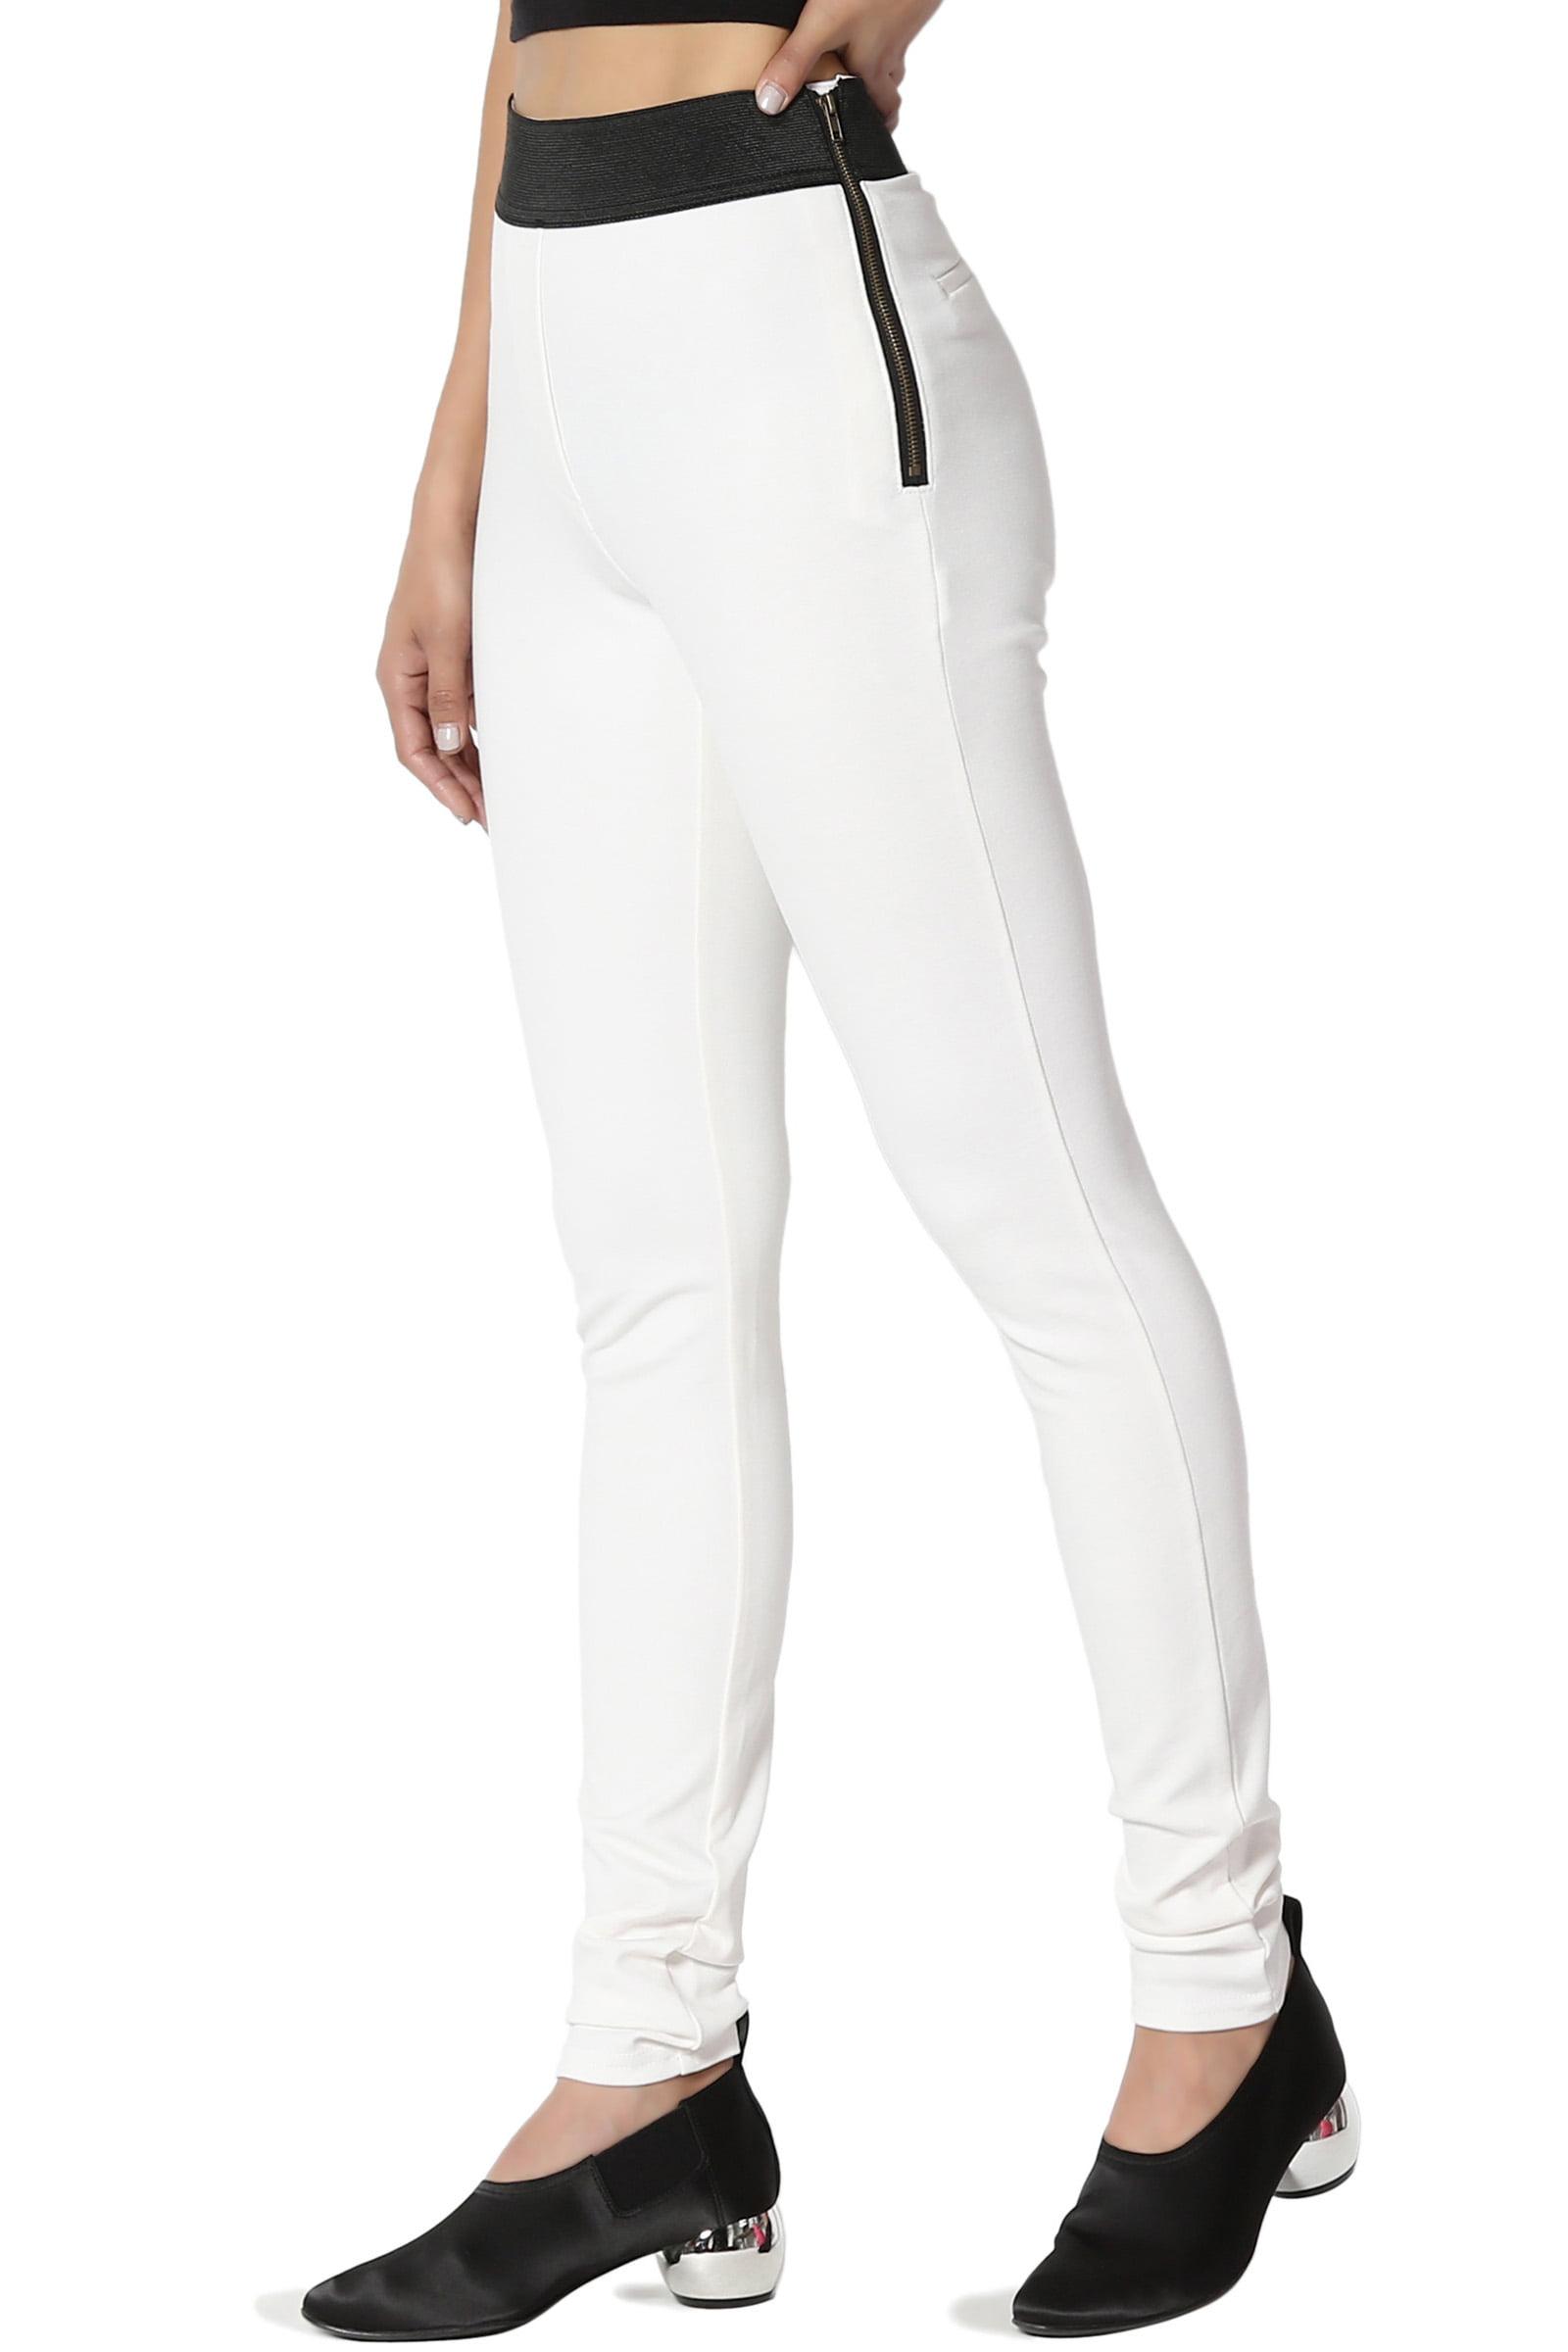 TheMogan Junior's Elastic High Waist Stretch Ponte Jersey Knit Curvy Skinny Pants